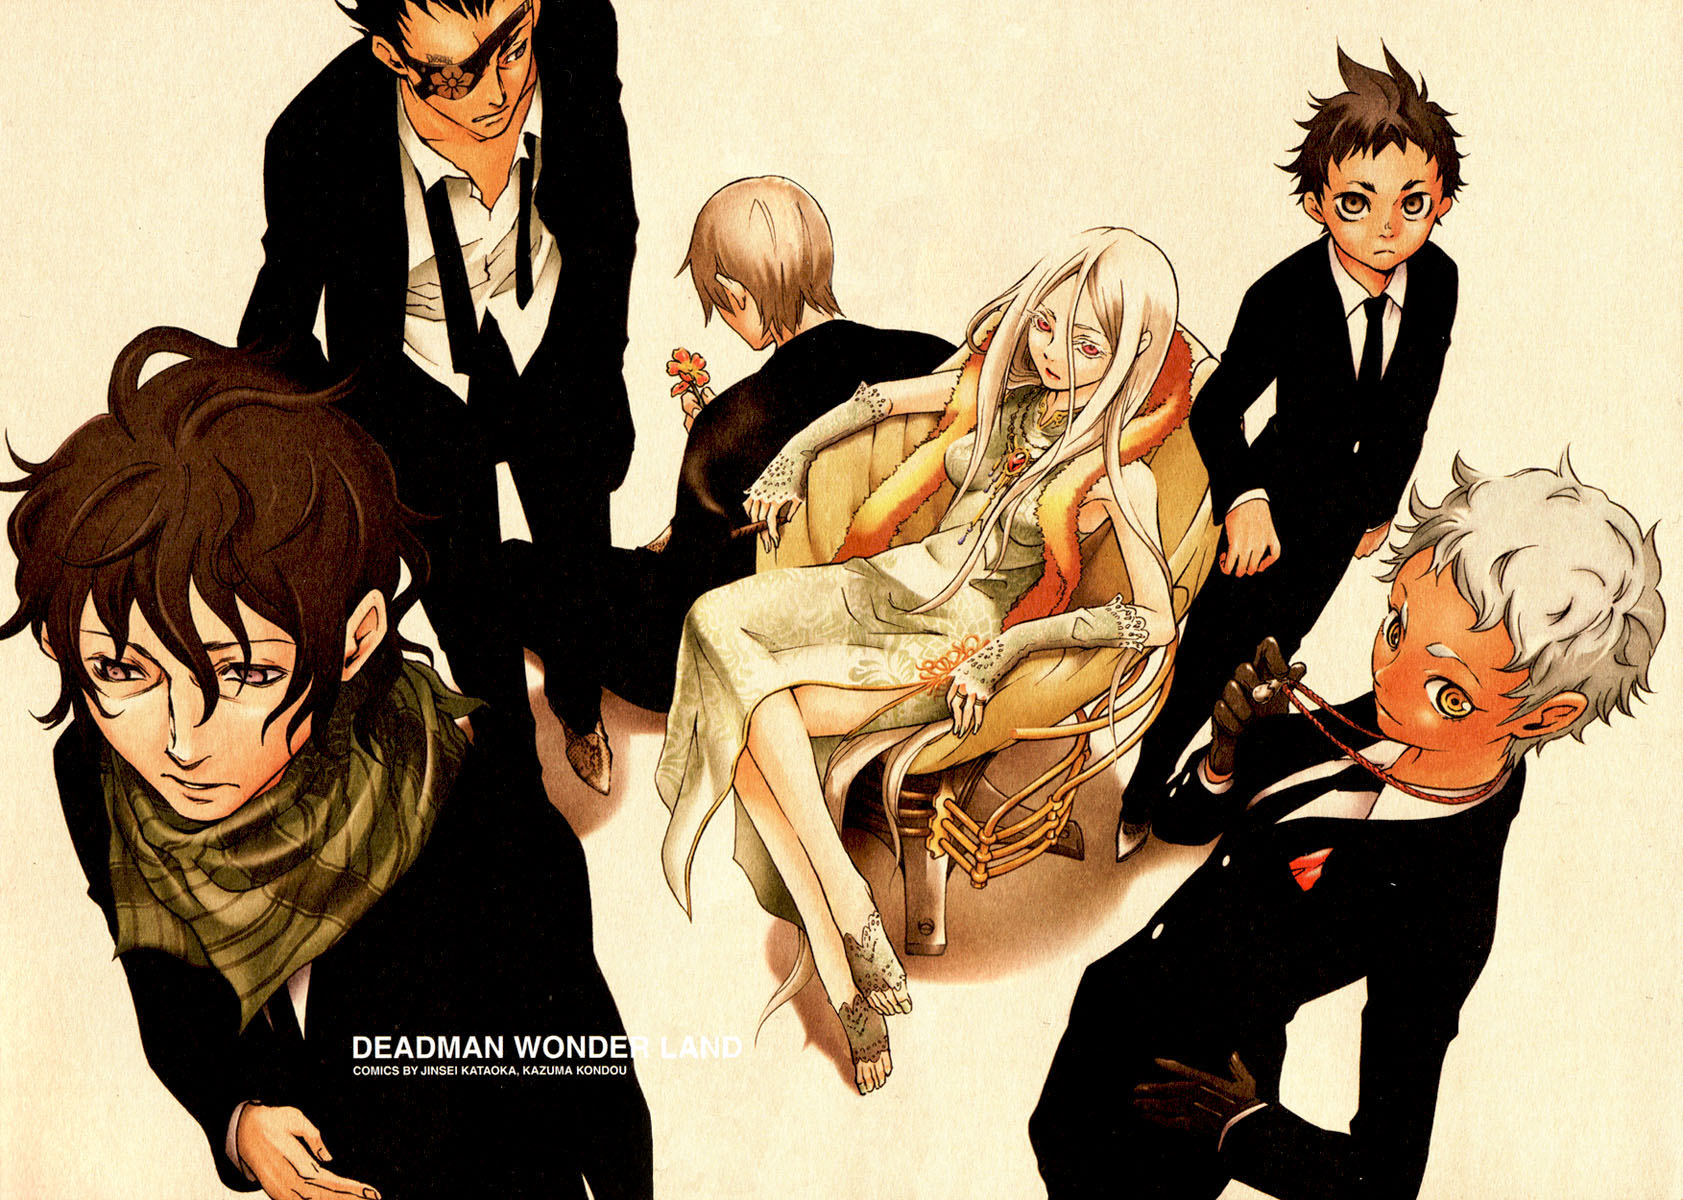 deadman_wonderland igarashi_ganta karako_koshio kengamine_nagi senji_kiyomasa shiro_(deadman_wonderland) takami_yoh